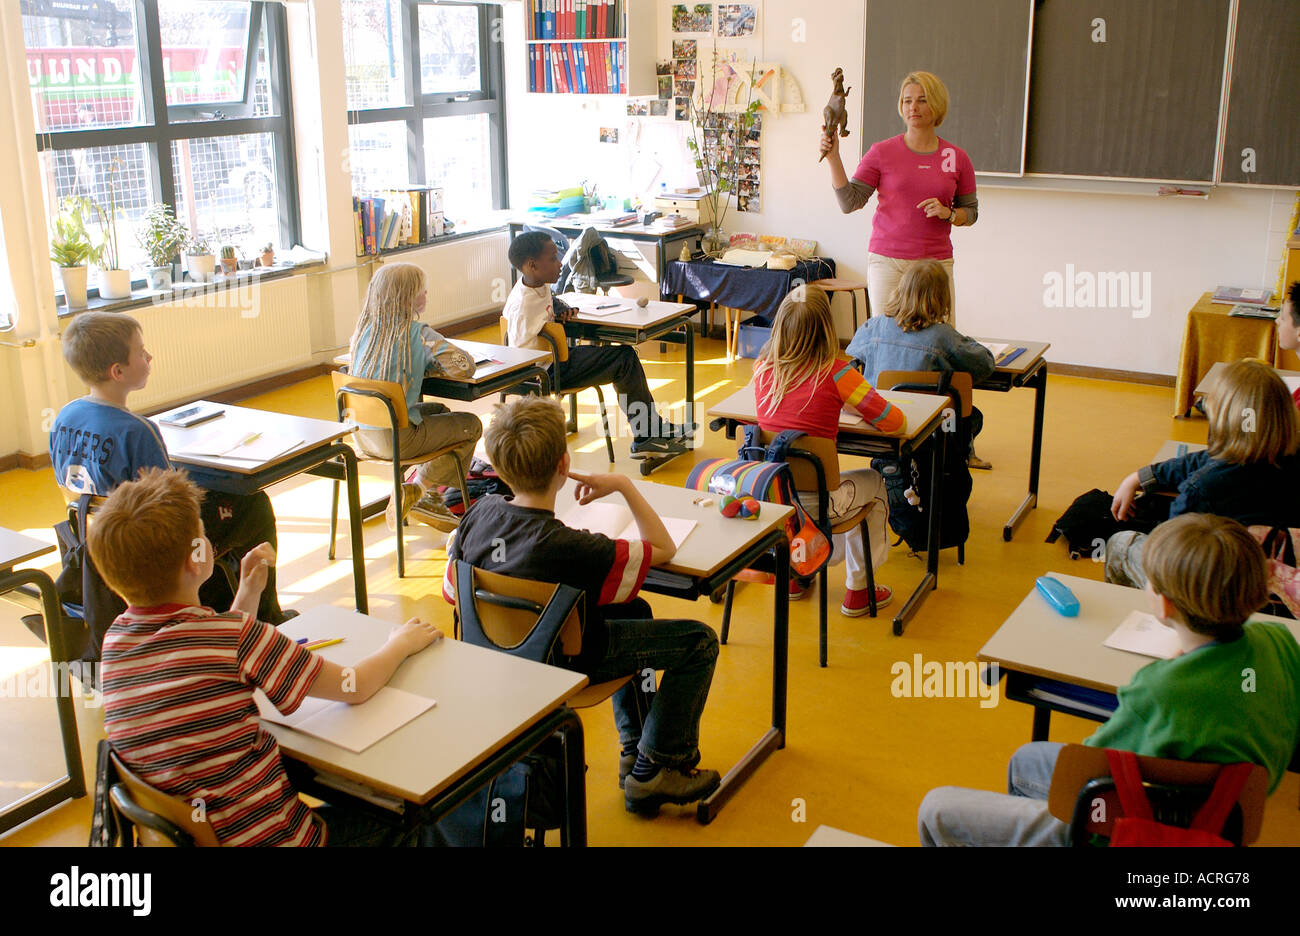 Students In Classroom Of Primary School Stock Photo